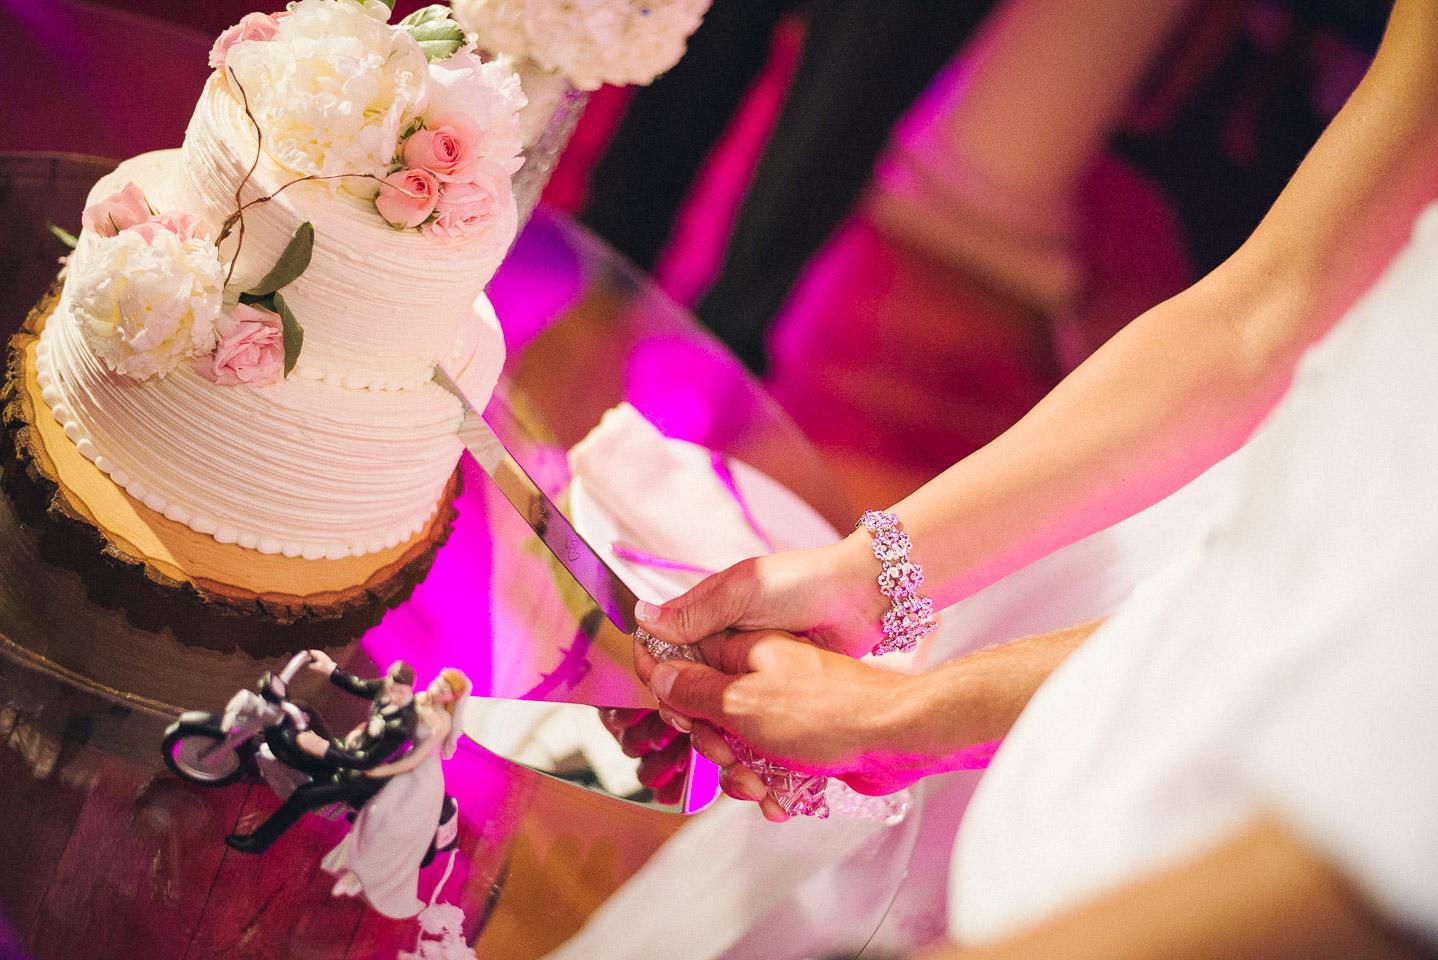 NH Wedding Photographer: cake cutting